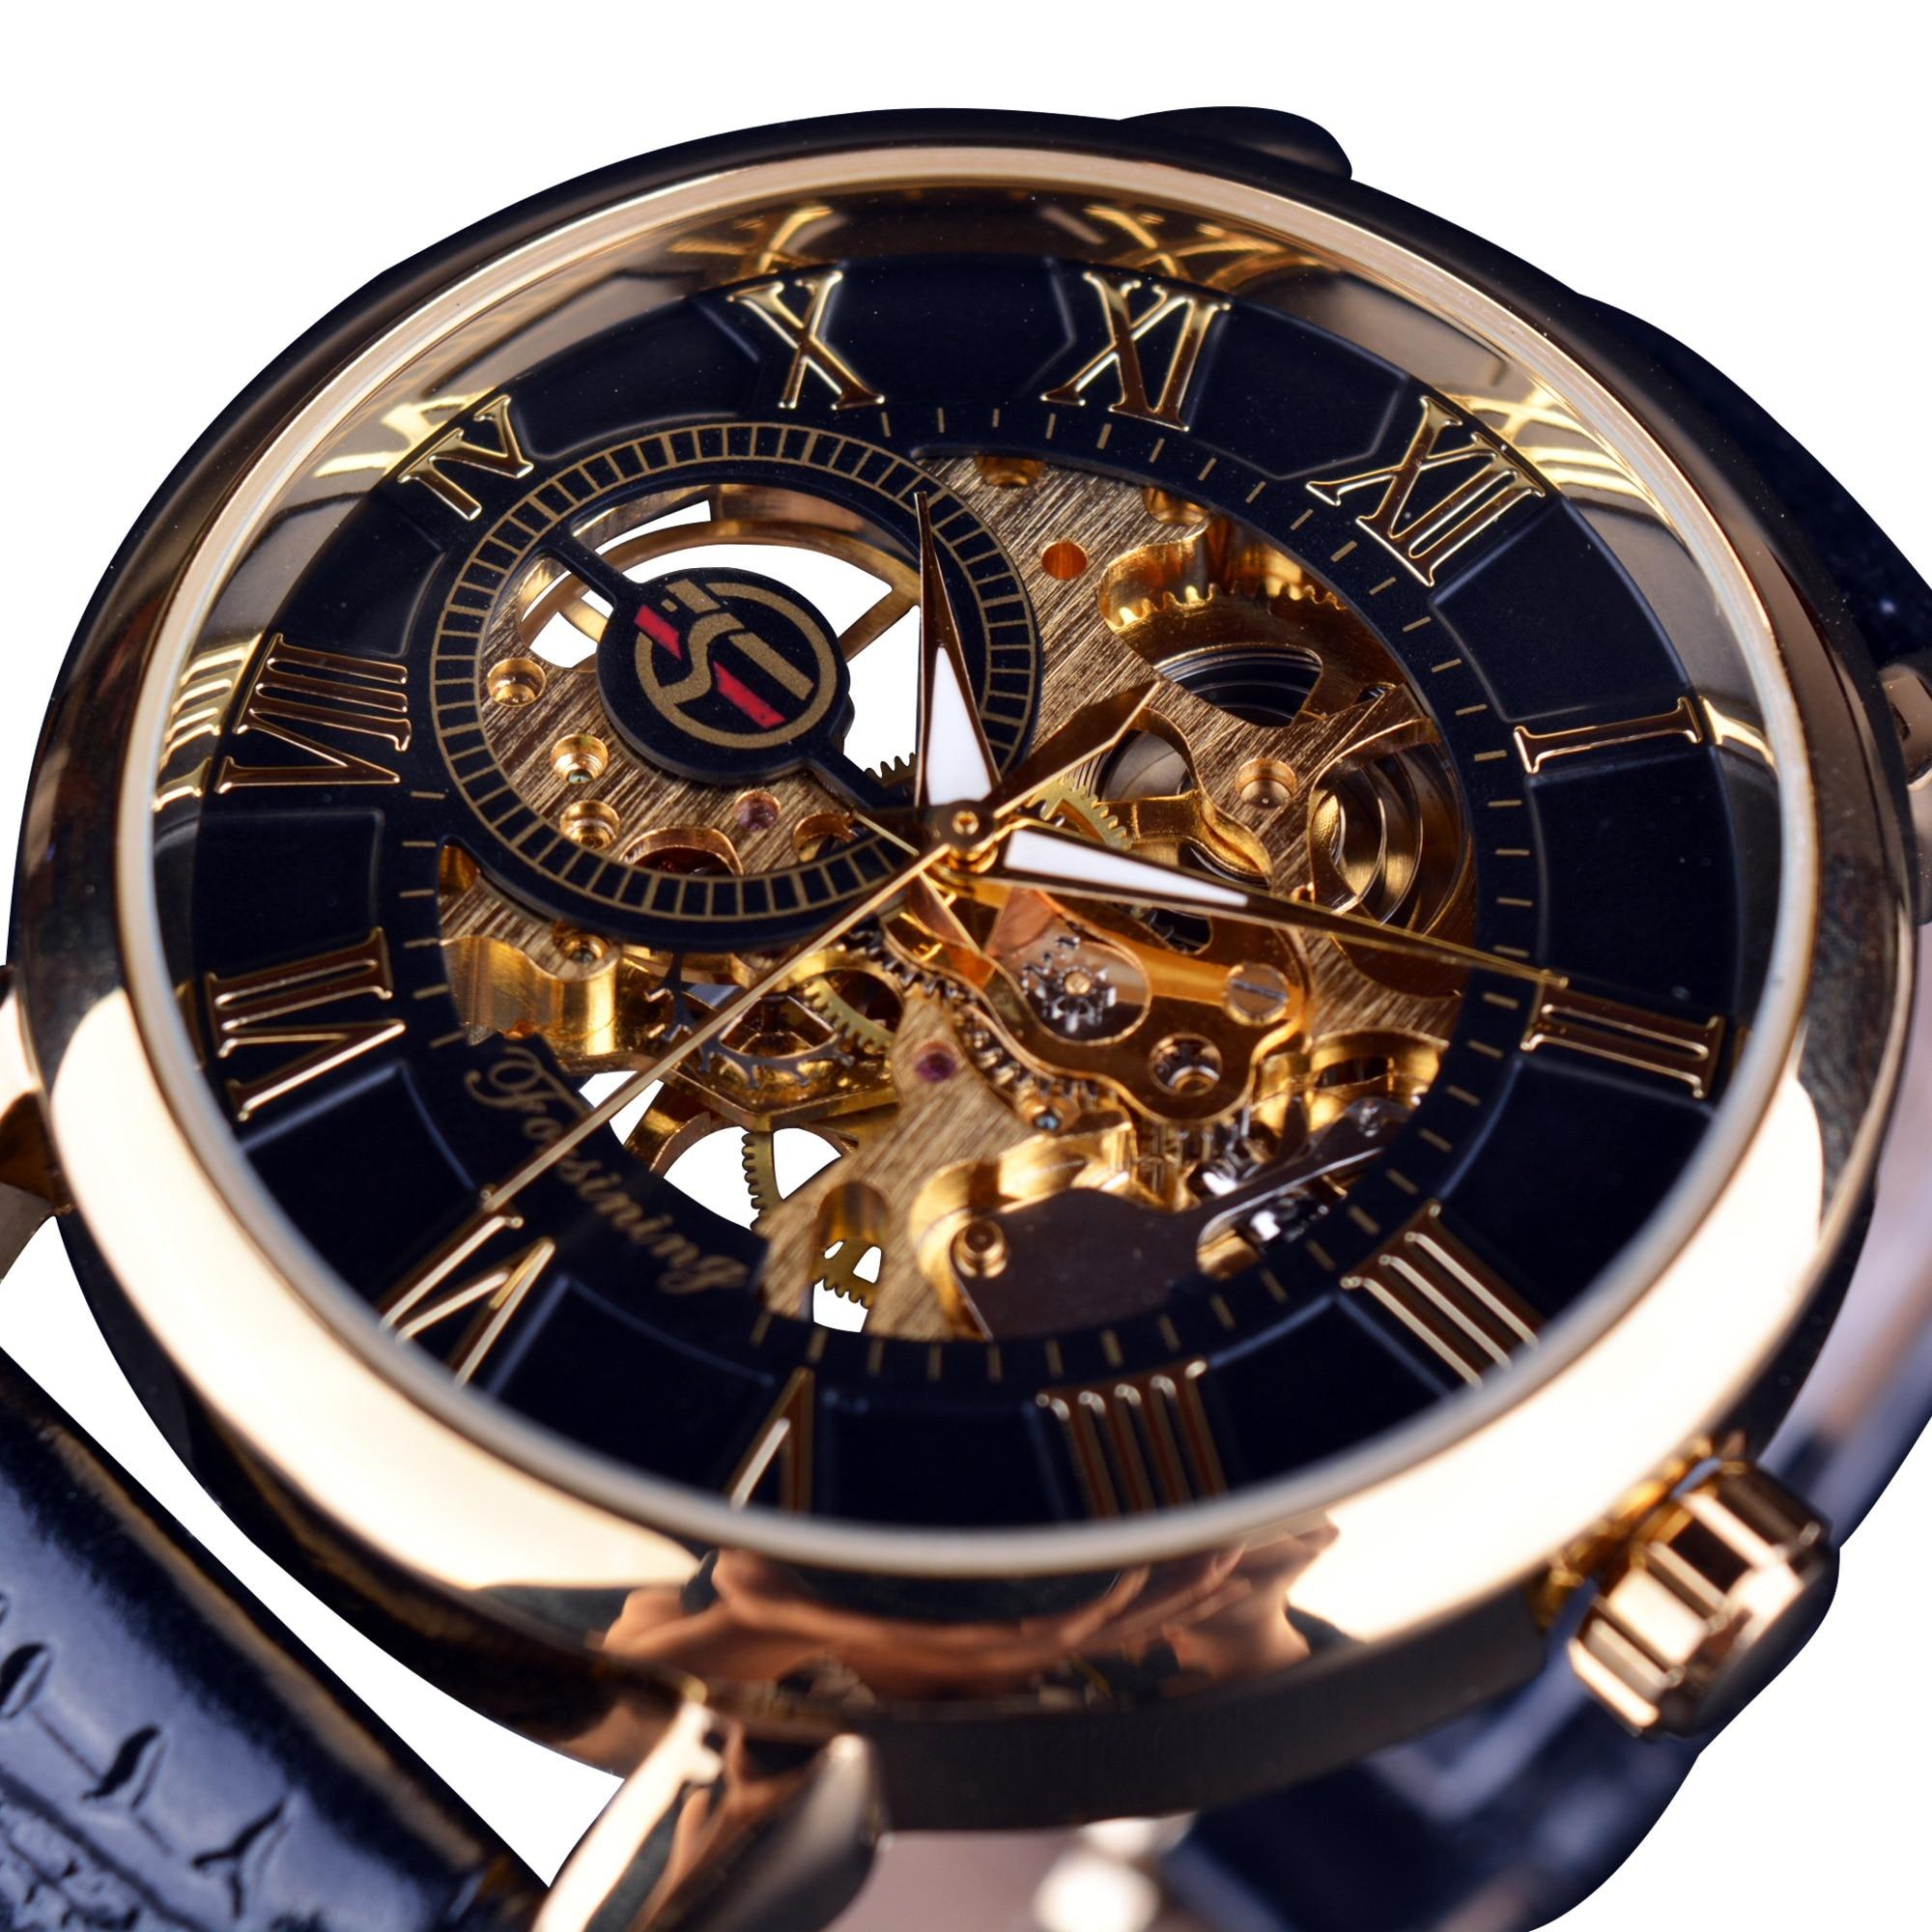 1878a75f667 Forsining 3d Logo Design Hollow Engraving Black Gold Case Leather Skeleton  Mechanical Watches Men Luxury Brand Heren Horloge